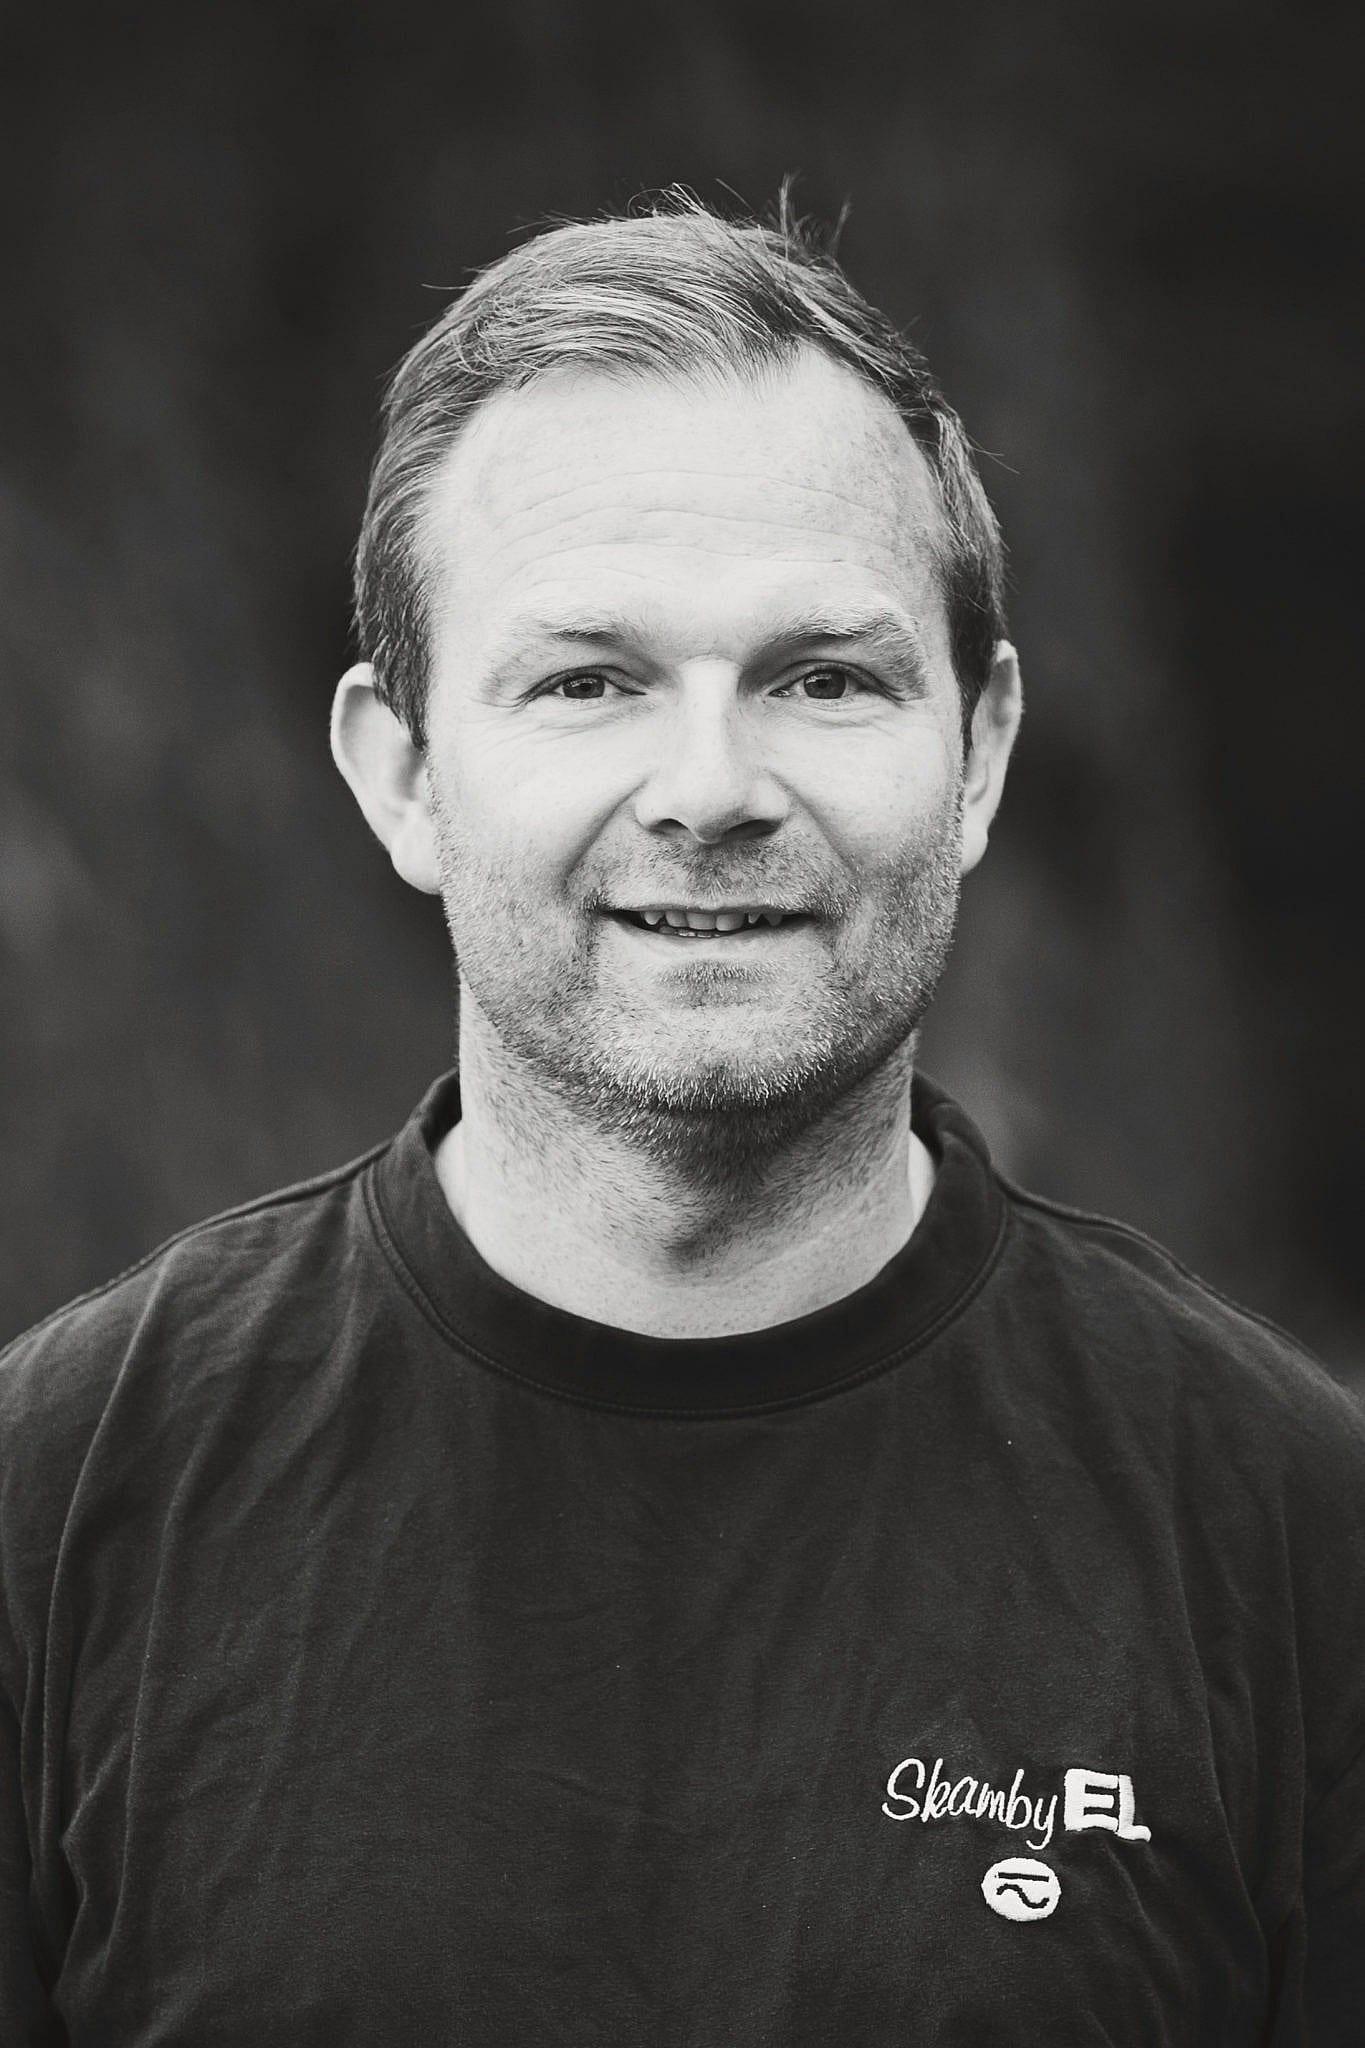 Martin Visti Rasmussen